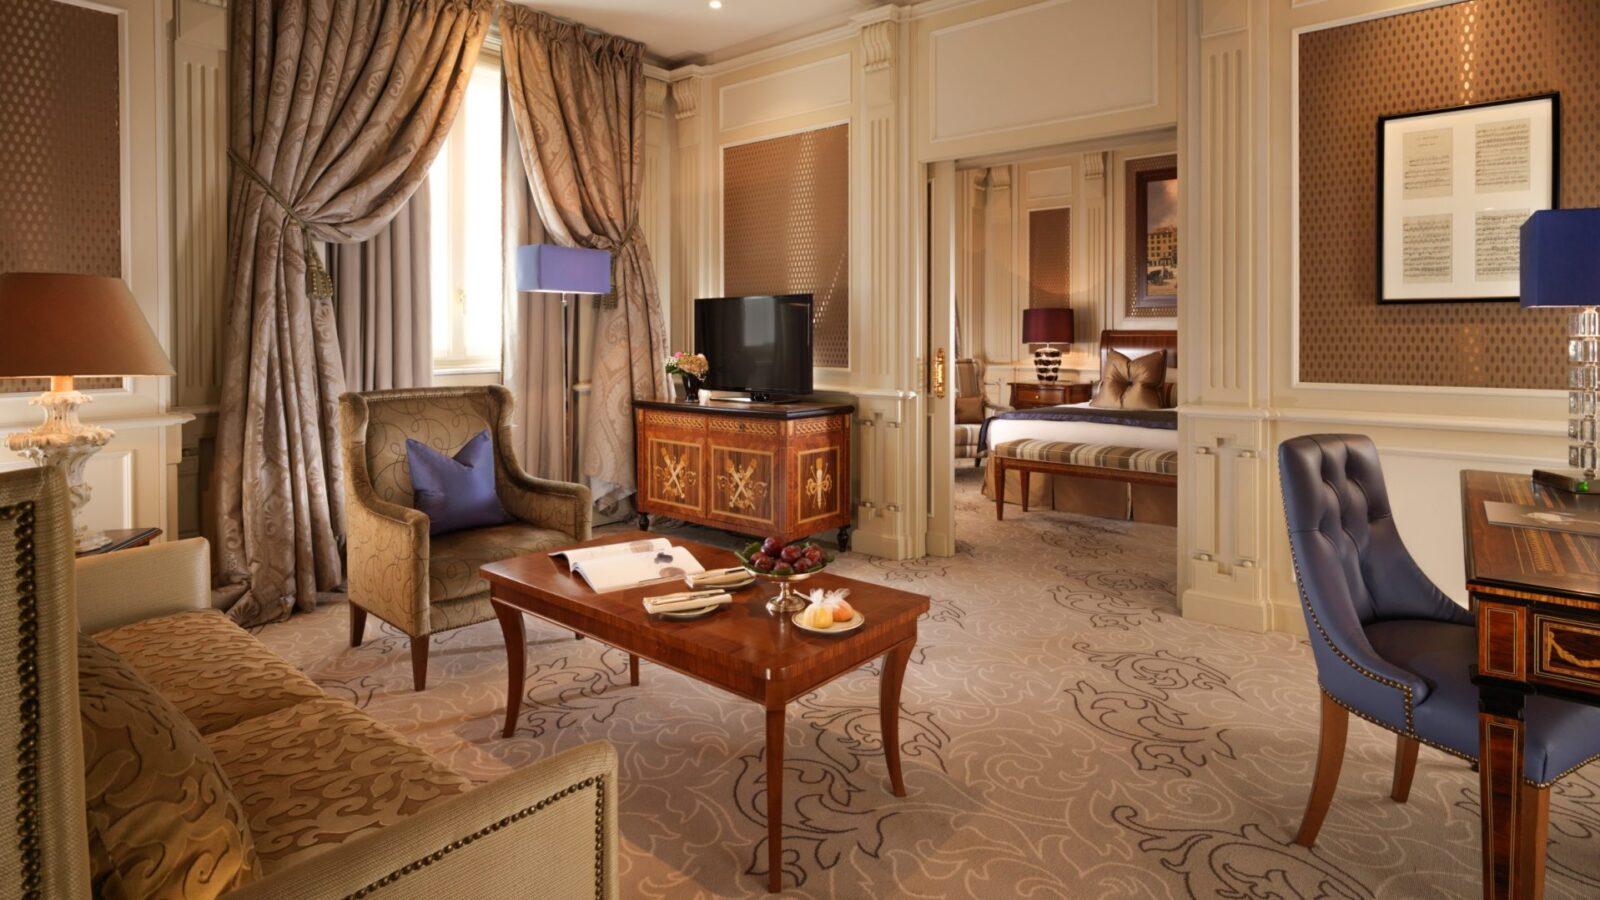 Ambassador Suite, Hotel Principe di Savoia, Milan